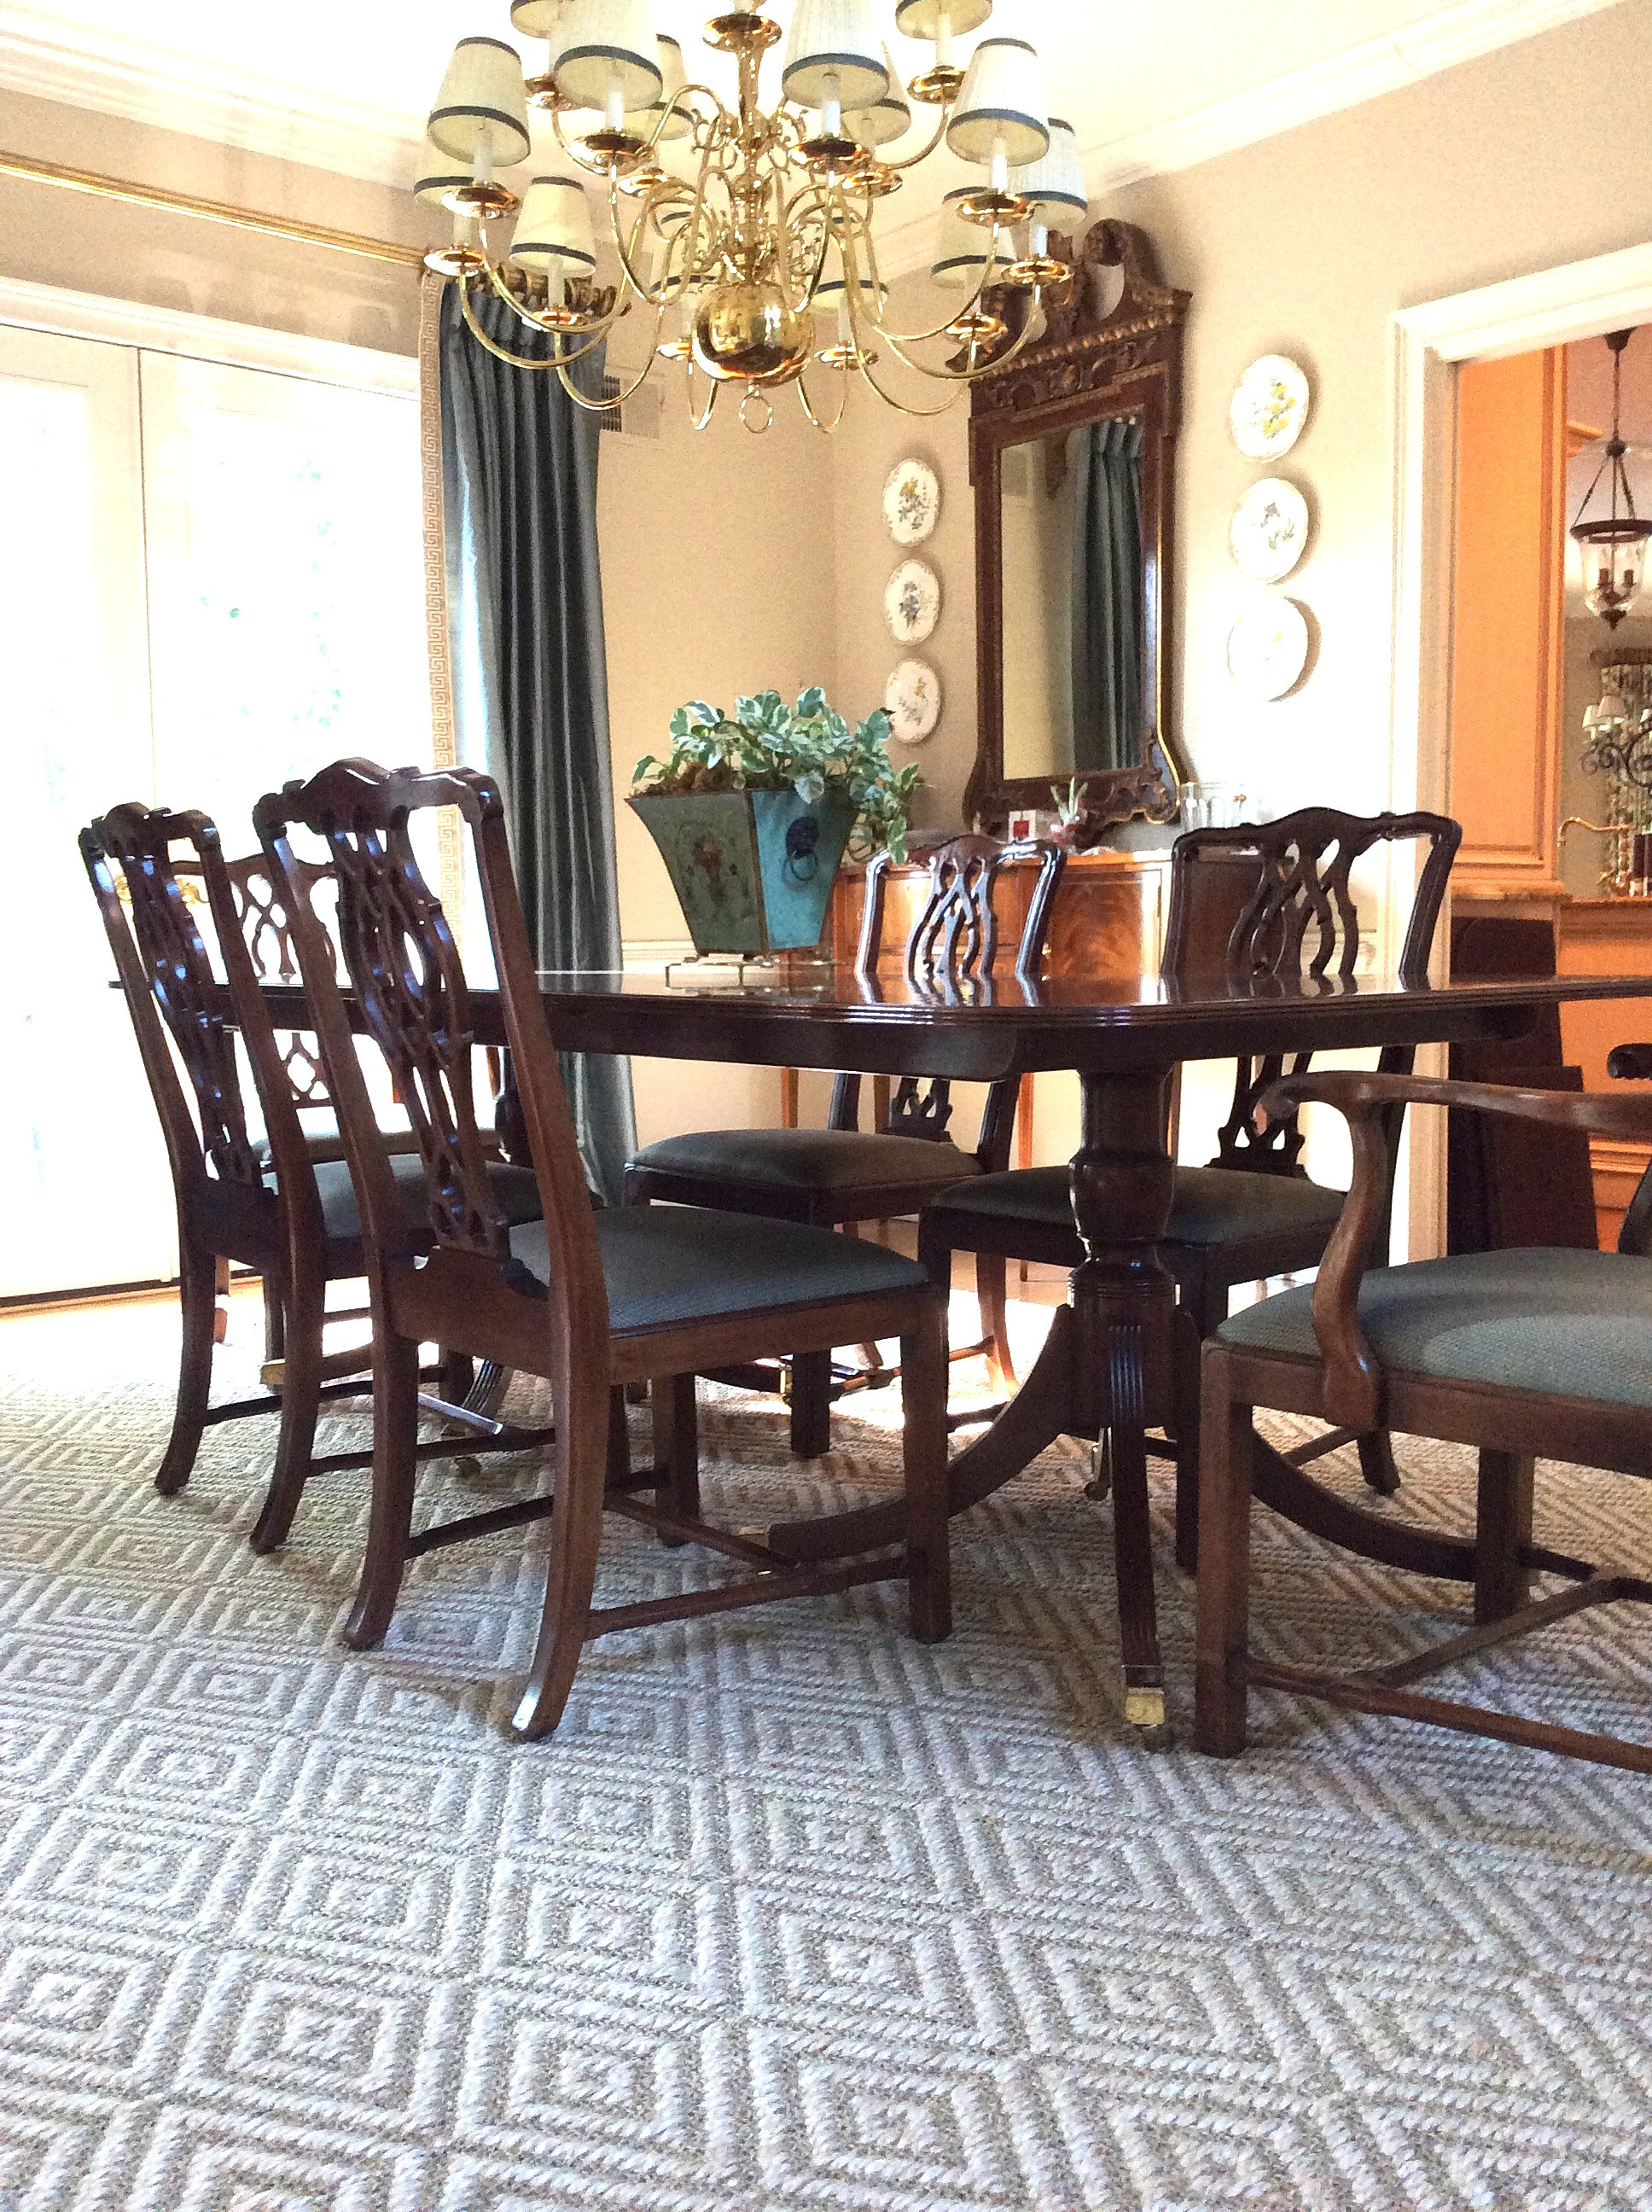 Interior designers in charleston sc - Stark Dining Room Rug Done By Charleston Sc Interior Designer